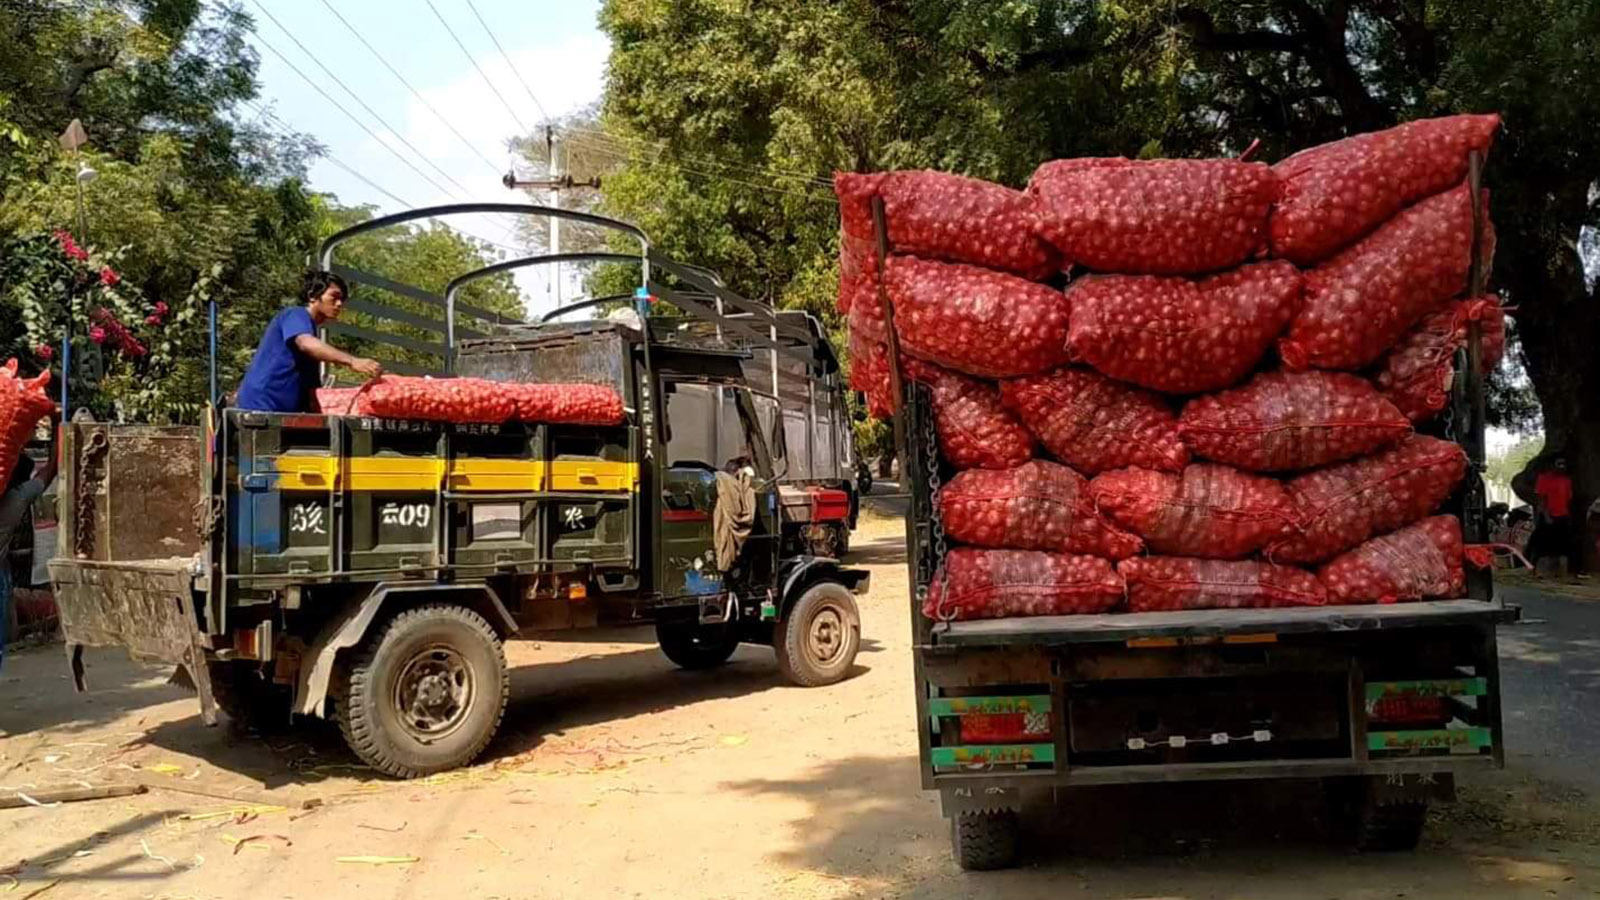 Trucks loaded of onions seen in Monywa. Photo:  Myo Win Tun